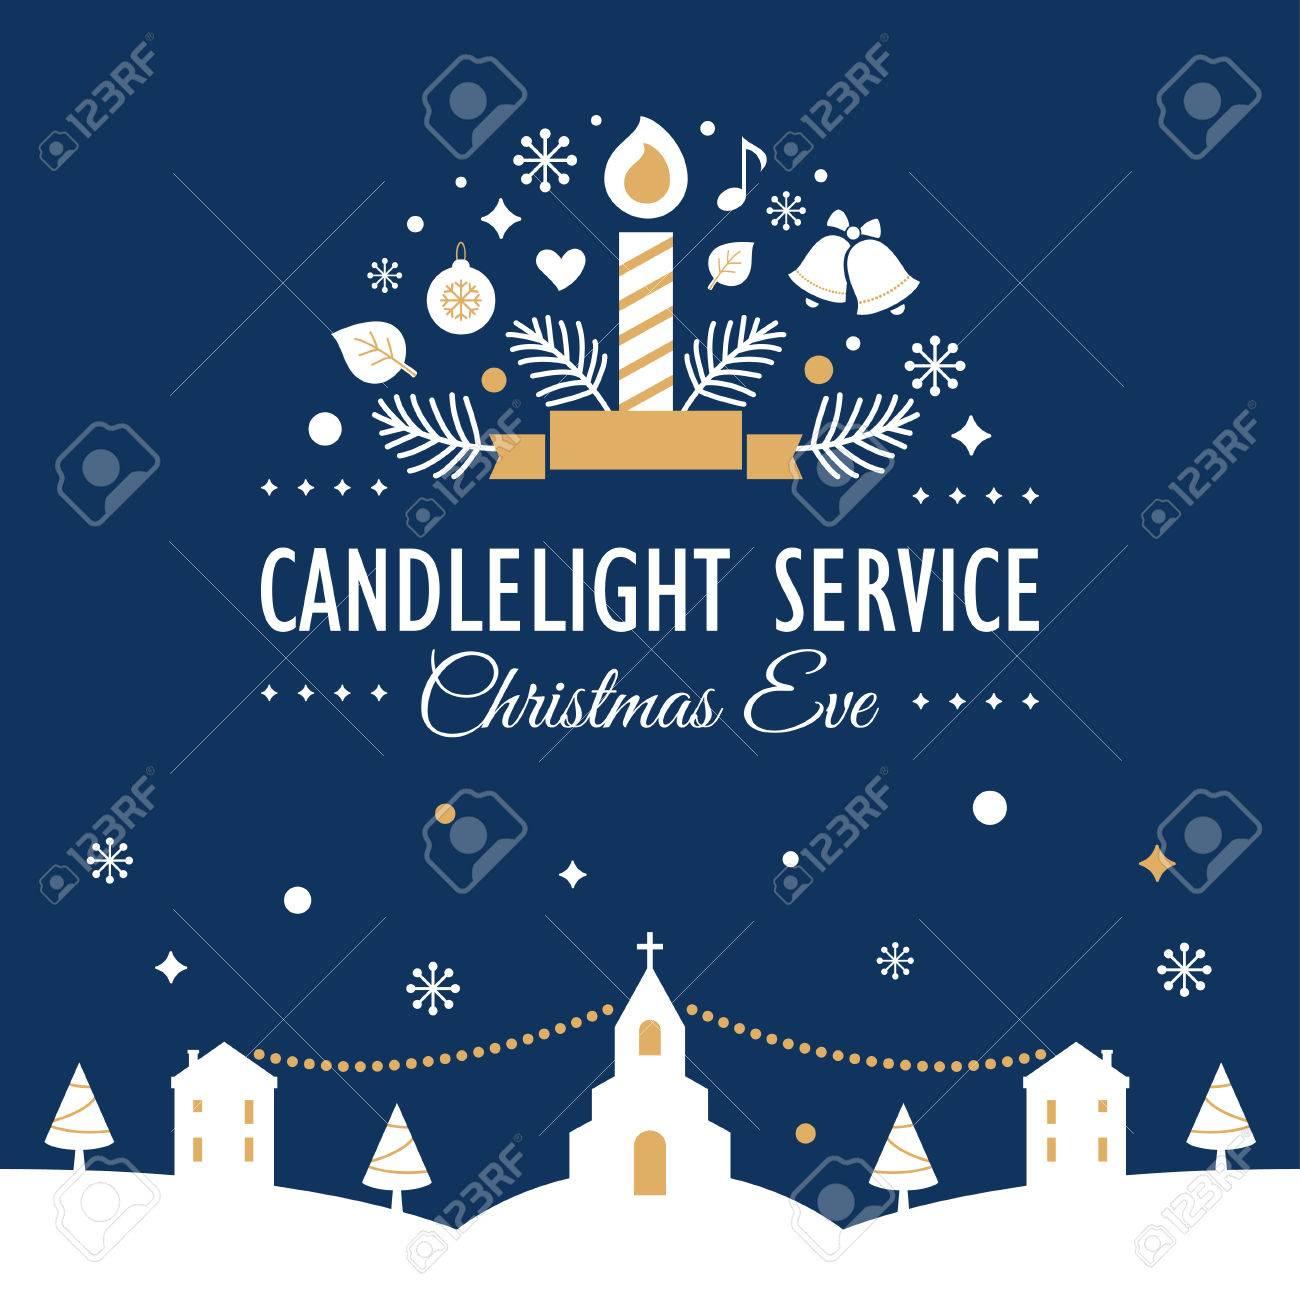 Christmas Eve Candlelight Service Invitation. Blurry Background.